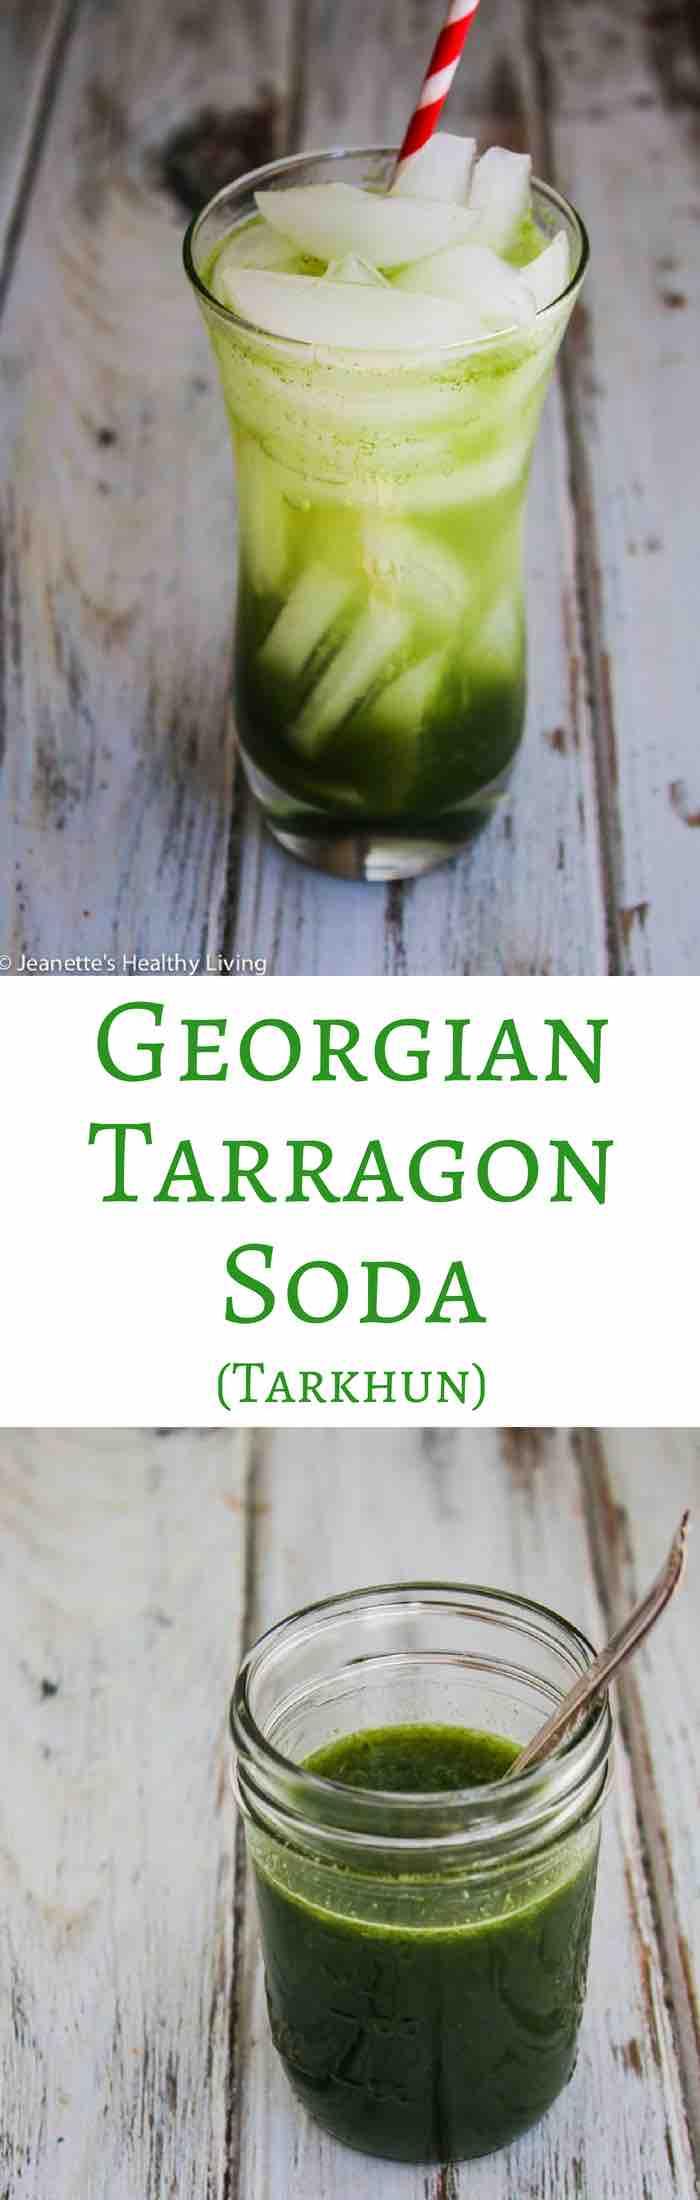 Tarragon: drink recipe. Soft drinks 85